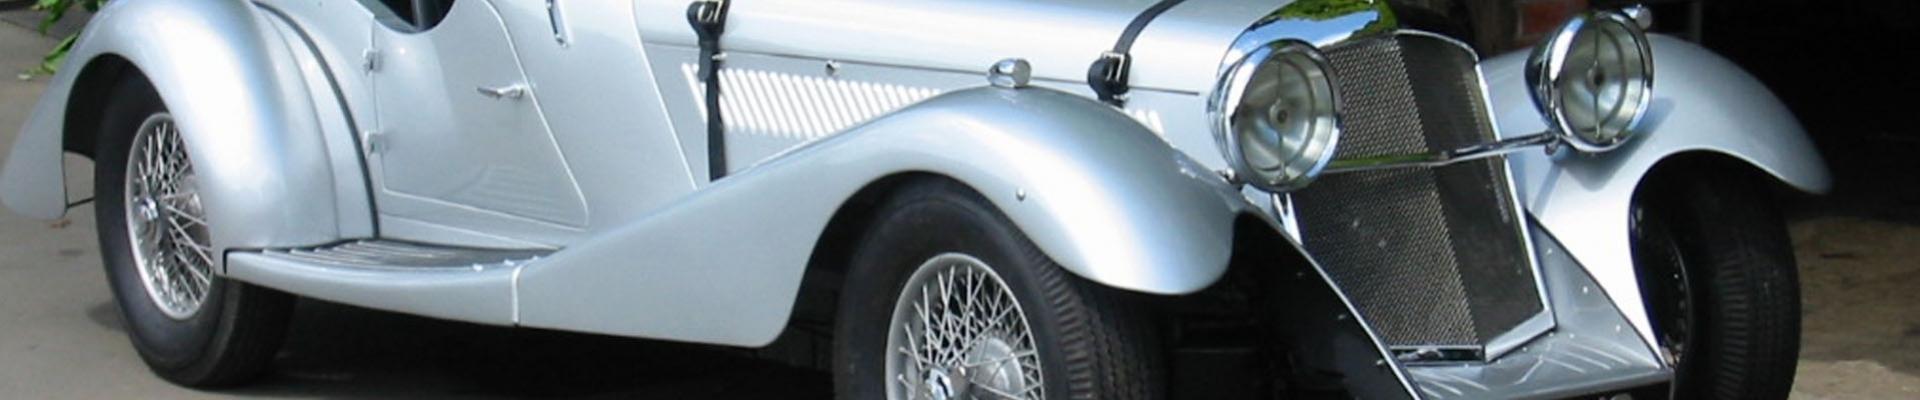 Classic Vehicle Repair - CTR Automotive | Auto Repair Janesville WI ...